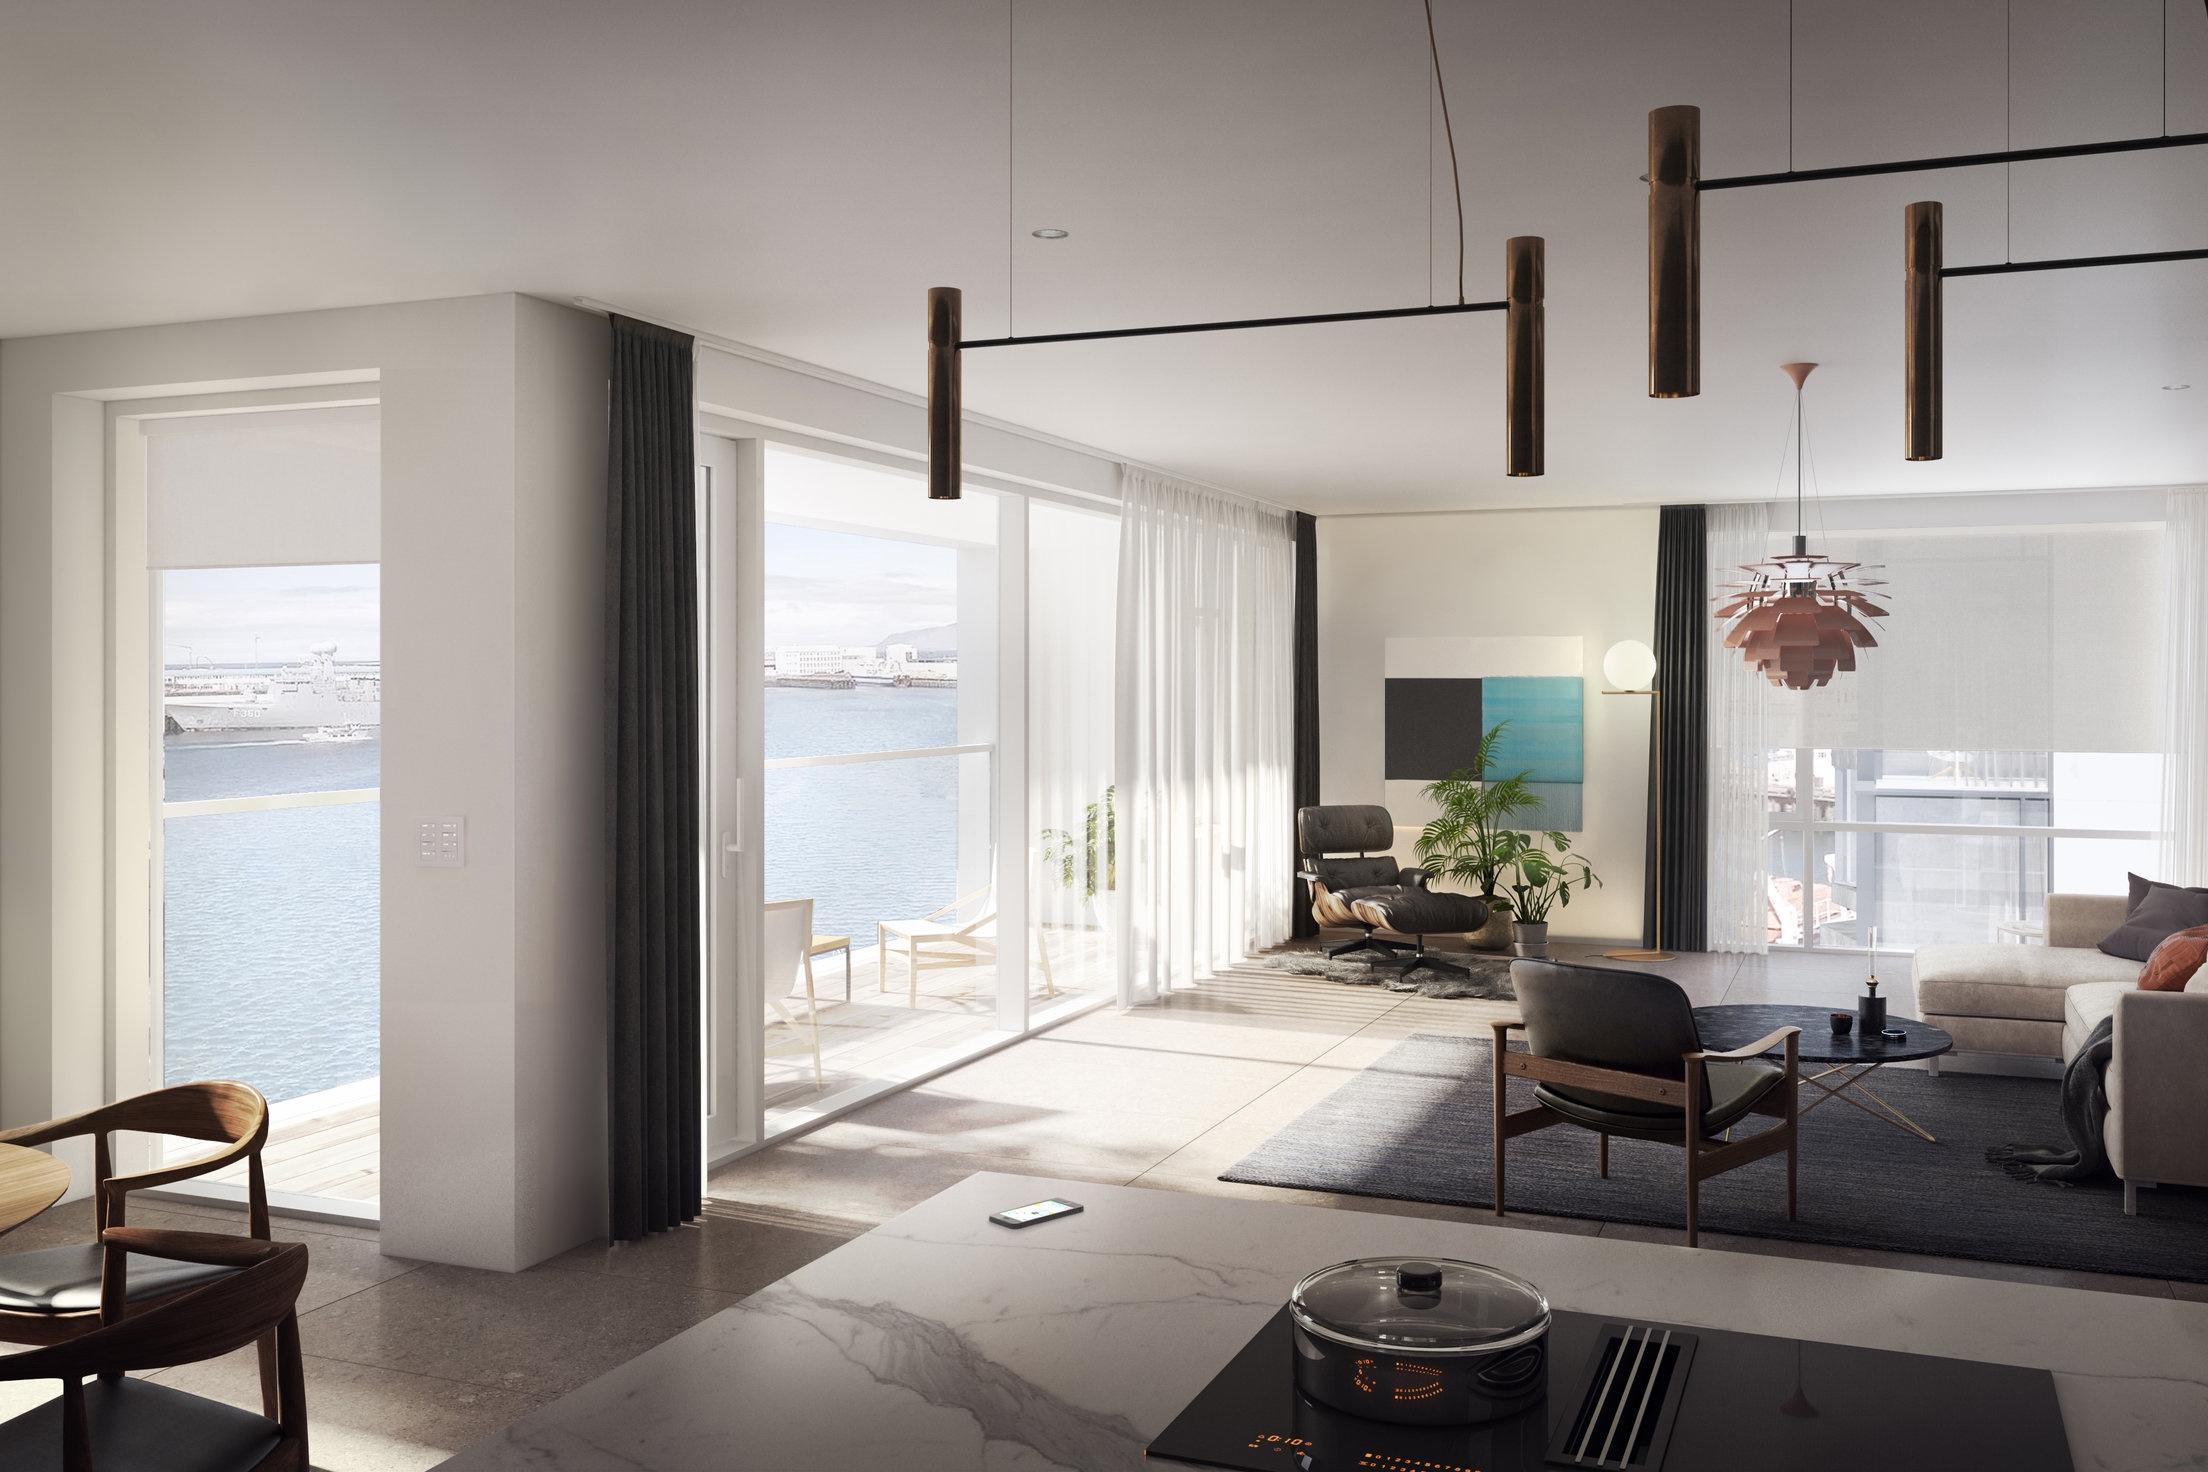 20190208_Livingroom_smarthome_k2visual-com.jpg